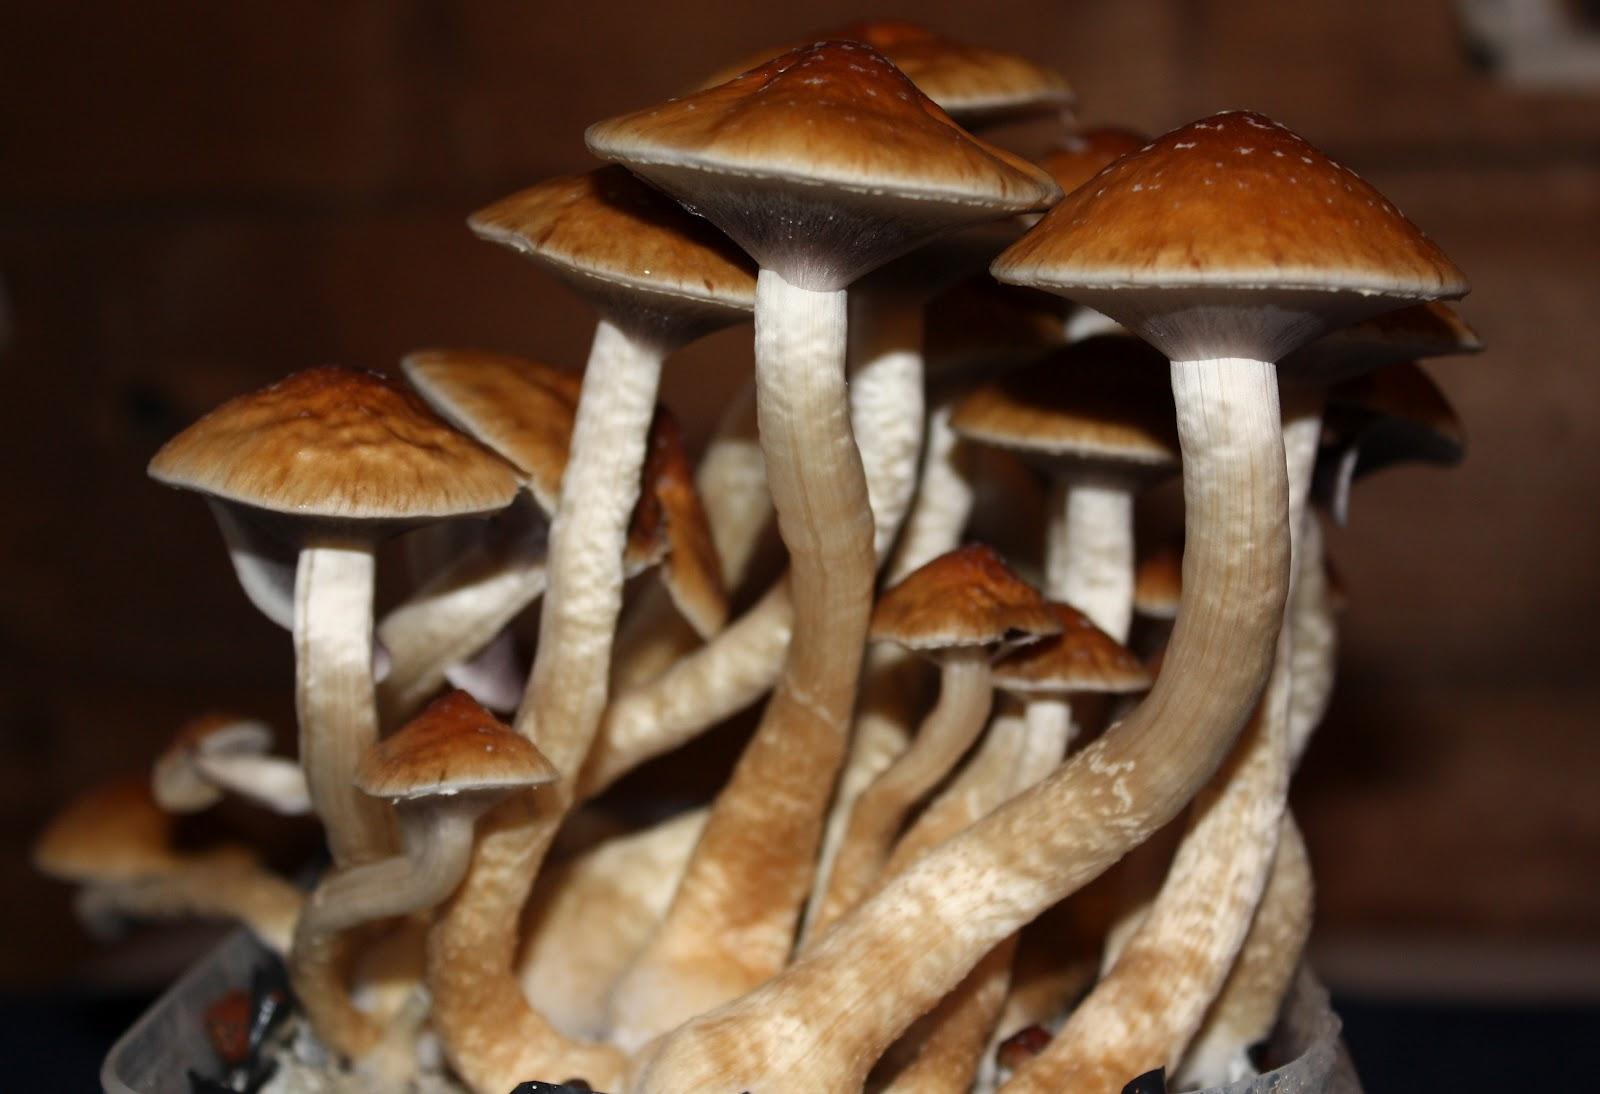 Legion of Shroom: Psilocybe cubensis